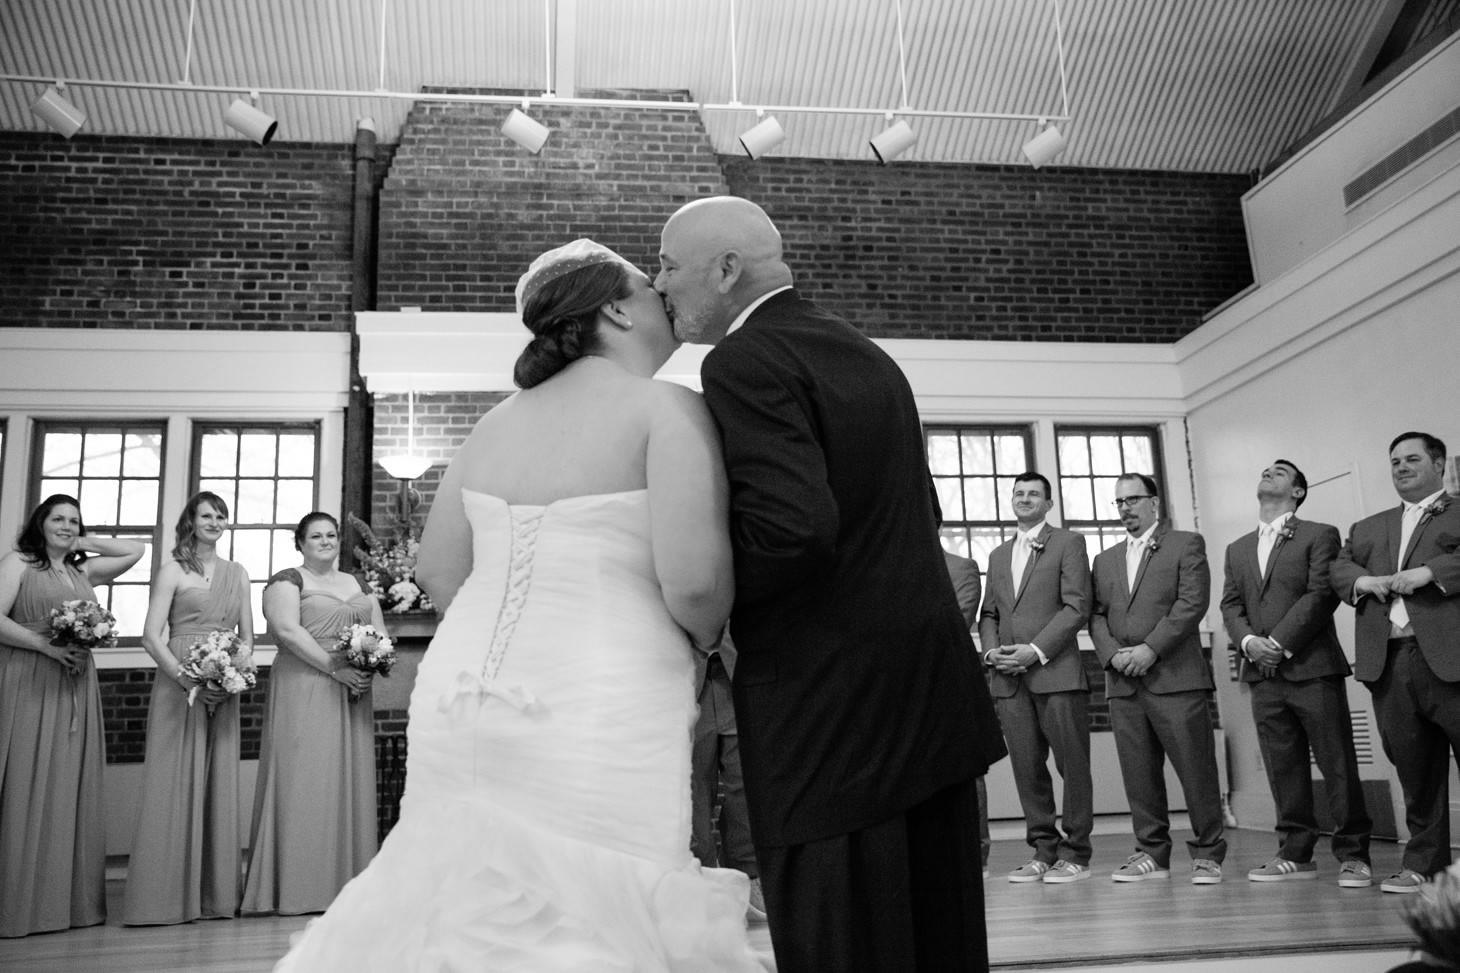 nyc-brooklyn-prospect-park-picnic-house-wedding-smitten-chickens-nerdy-29.jpg